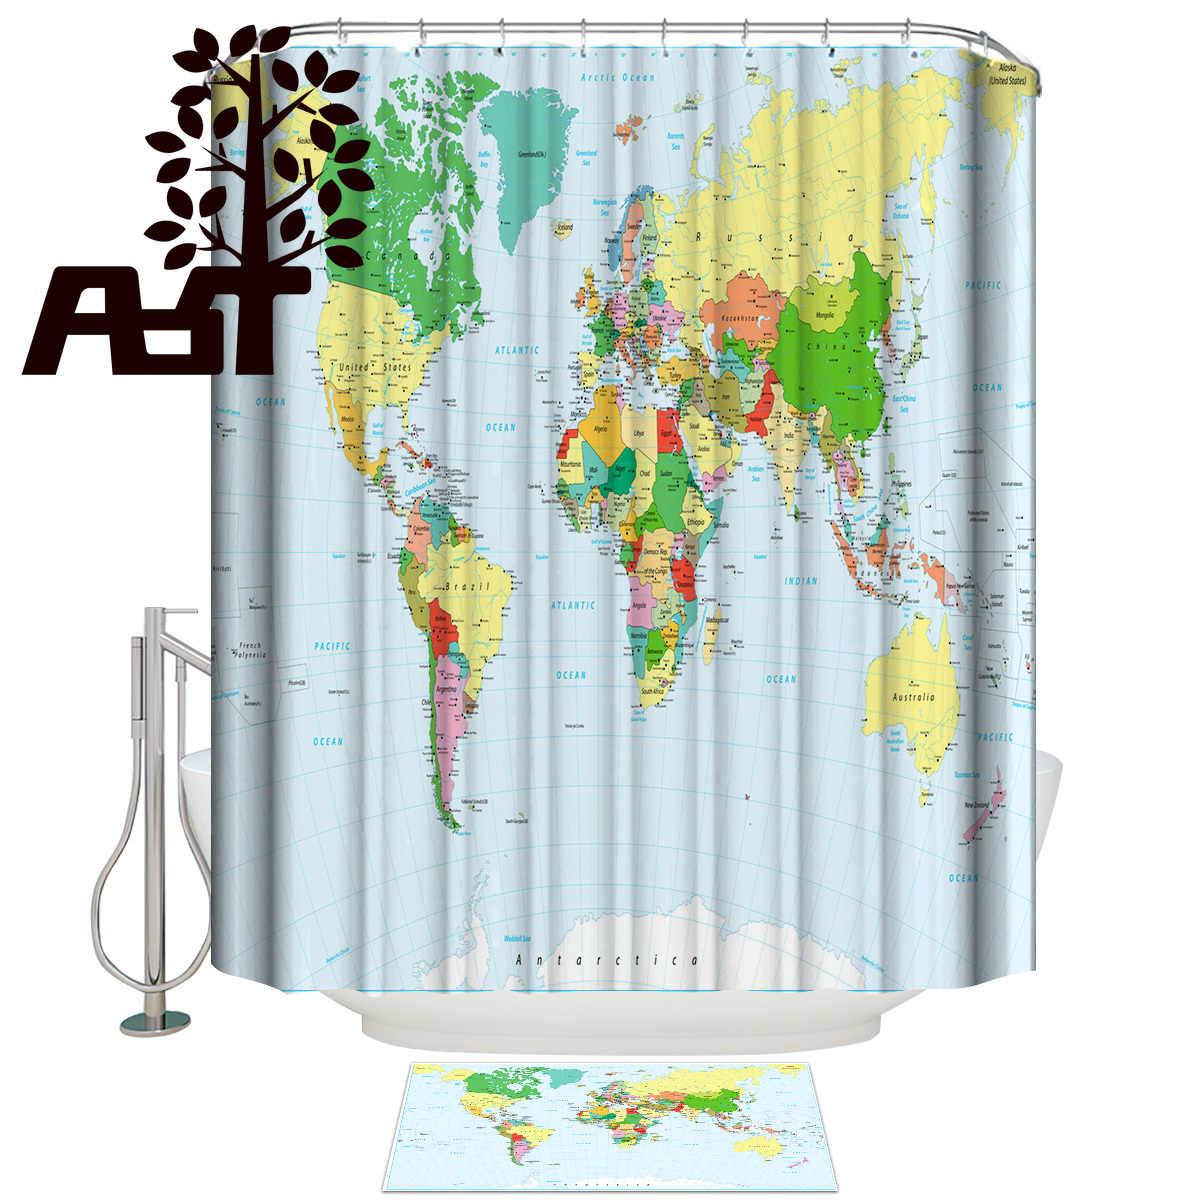 Art Store World Map Shower Curtain Bath Sets With Rugs 2 Piece Bathroom Set Bathroom Decor Set Outside Modern Women Rings Cute Shower Curtains Aliexpress